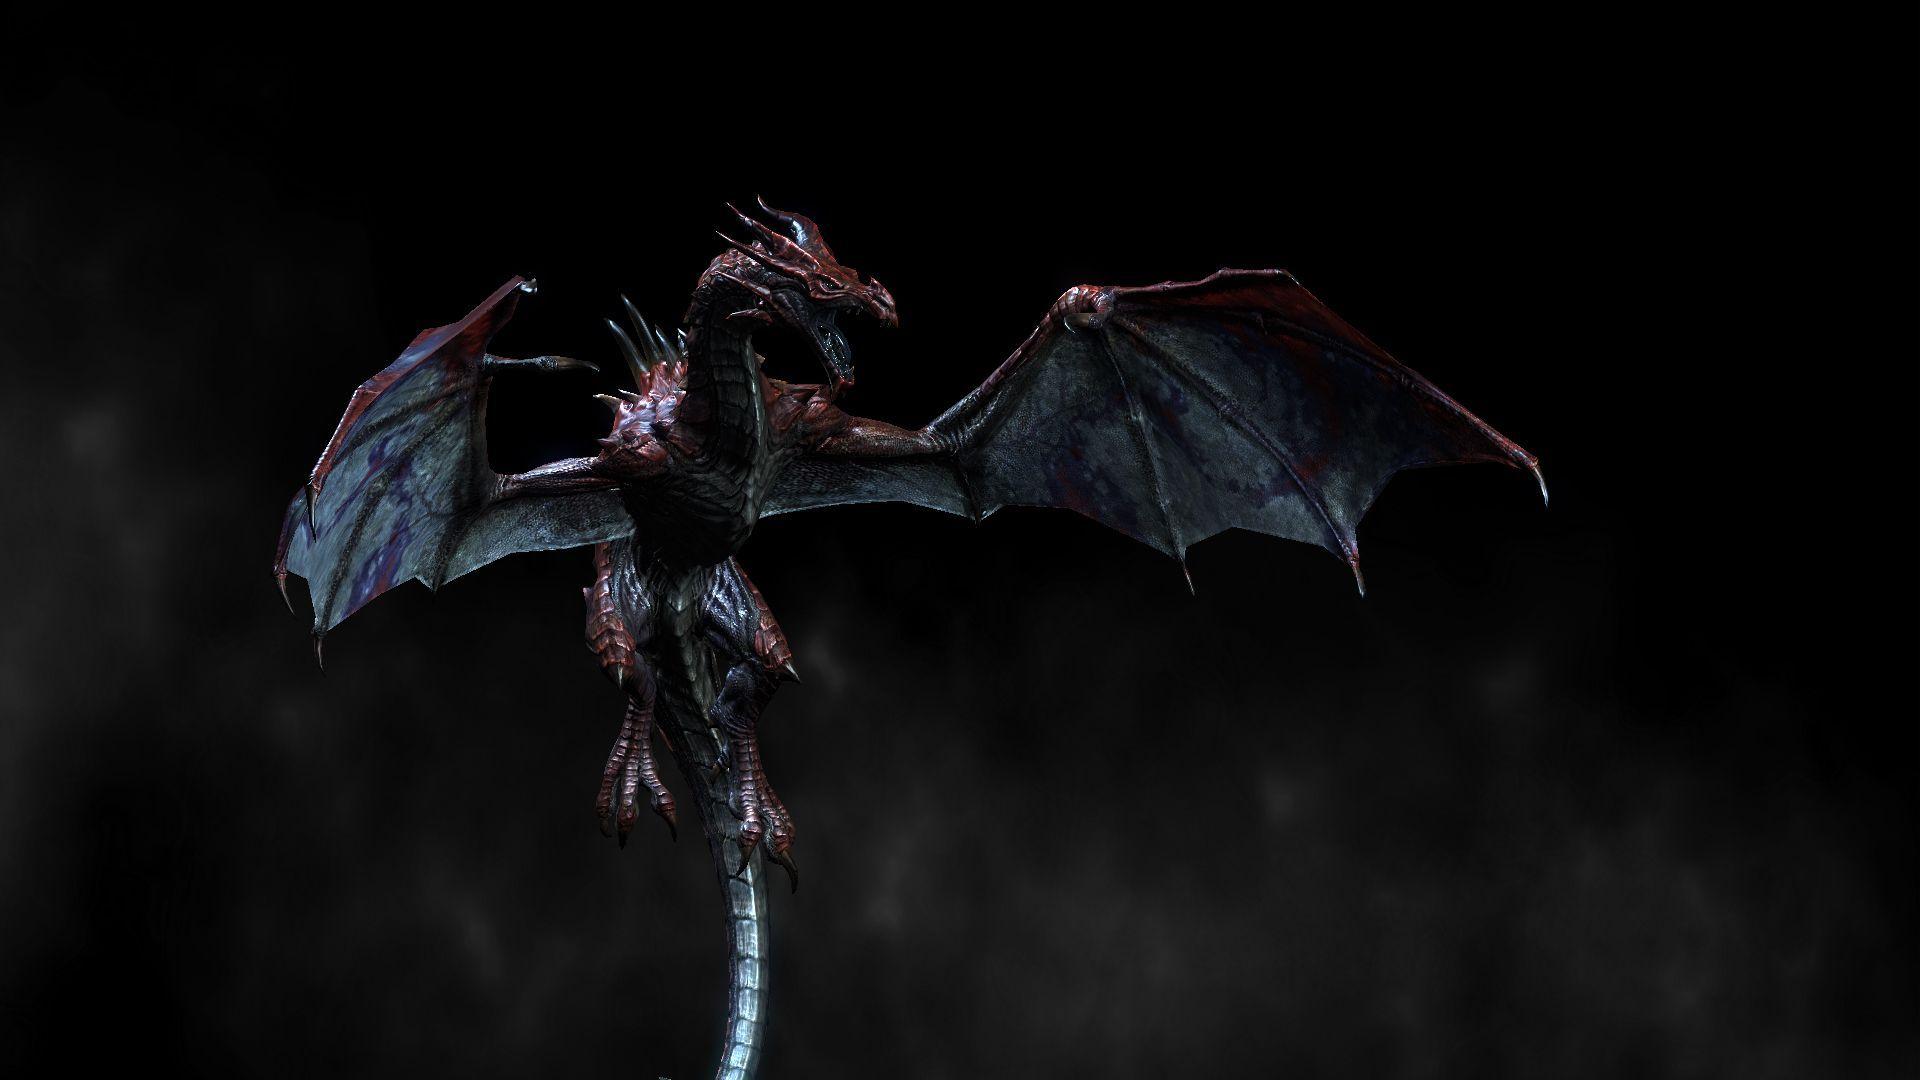 dark 3d dragon wallpaper